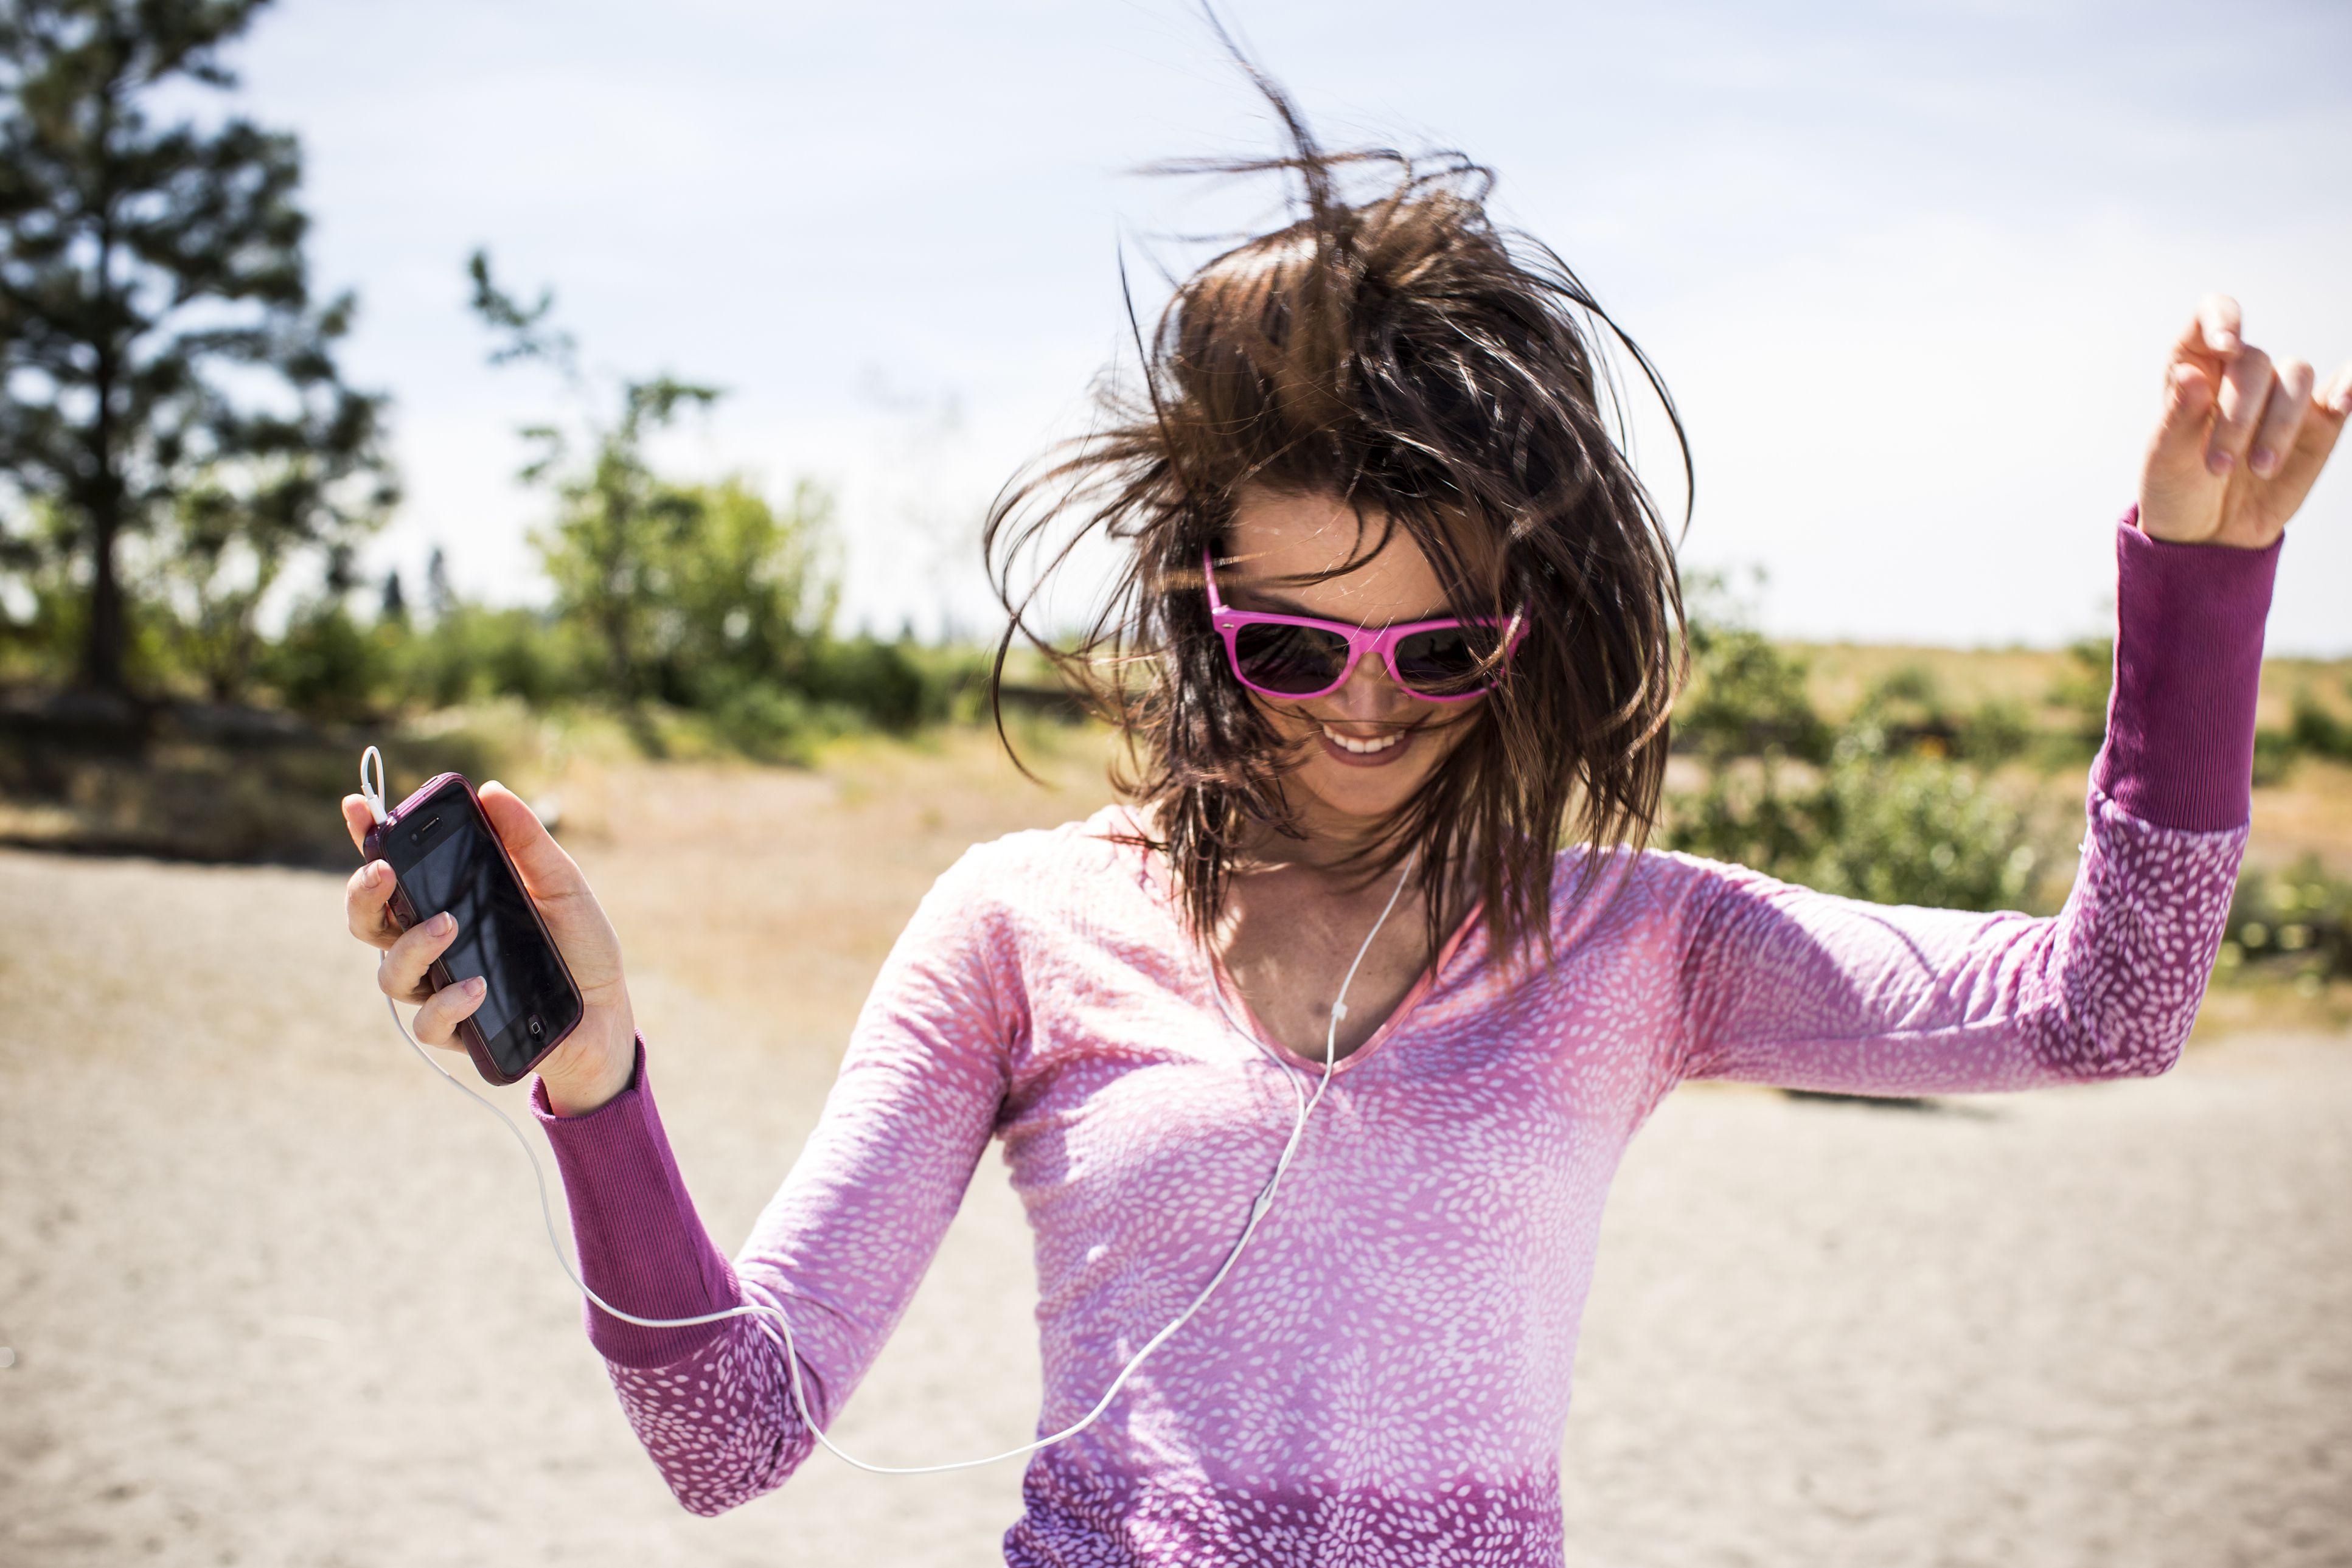 Girl dancing to music